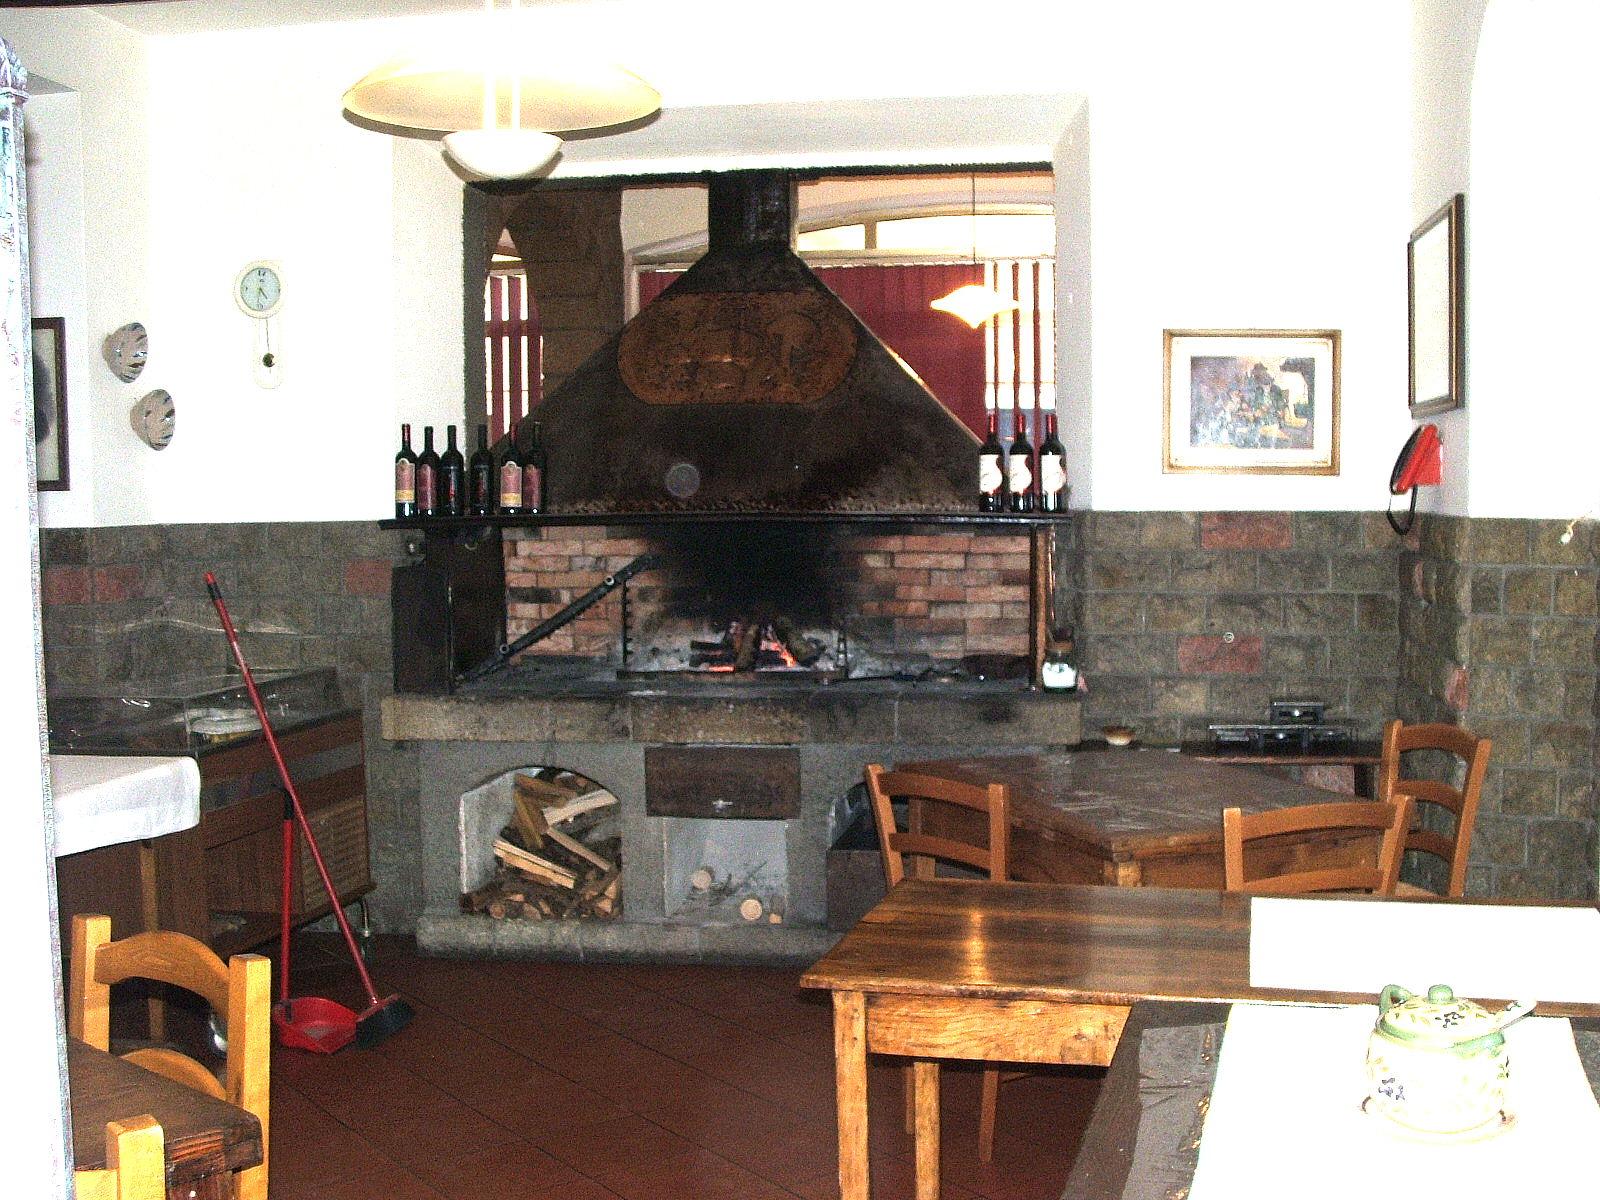 Cucina a legna wikipedia cucina a gas usata cucine a gas vintage